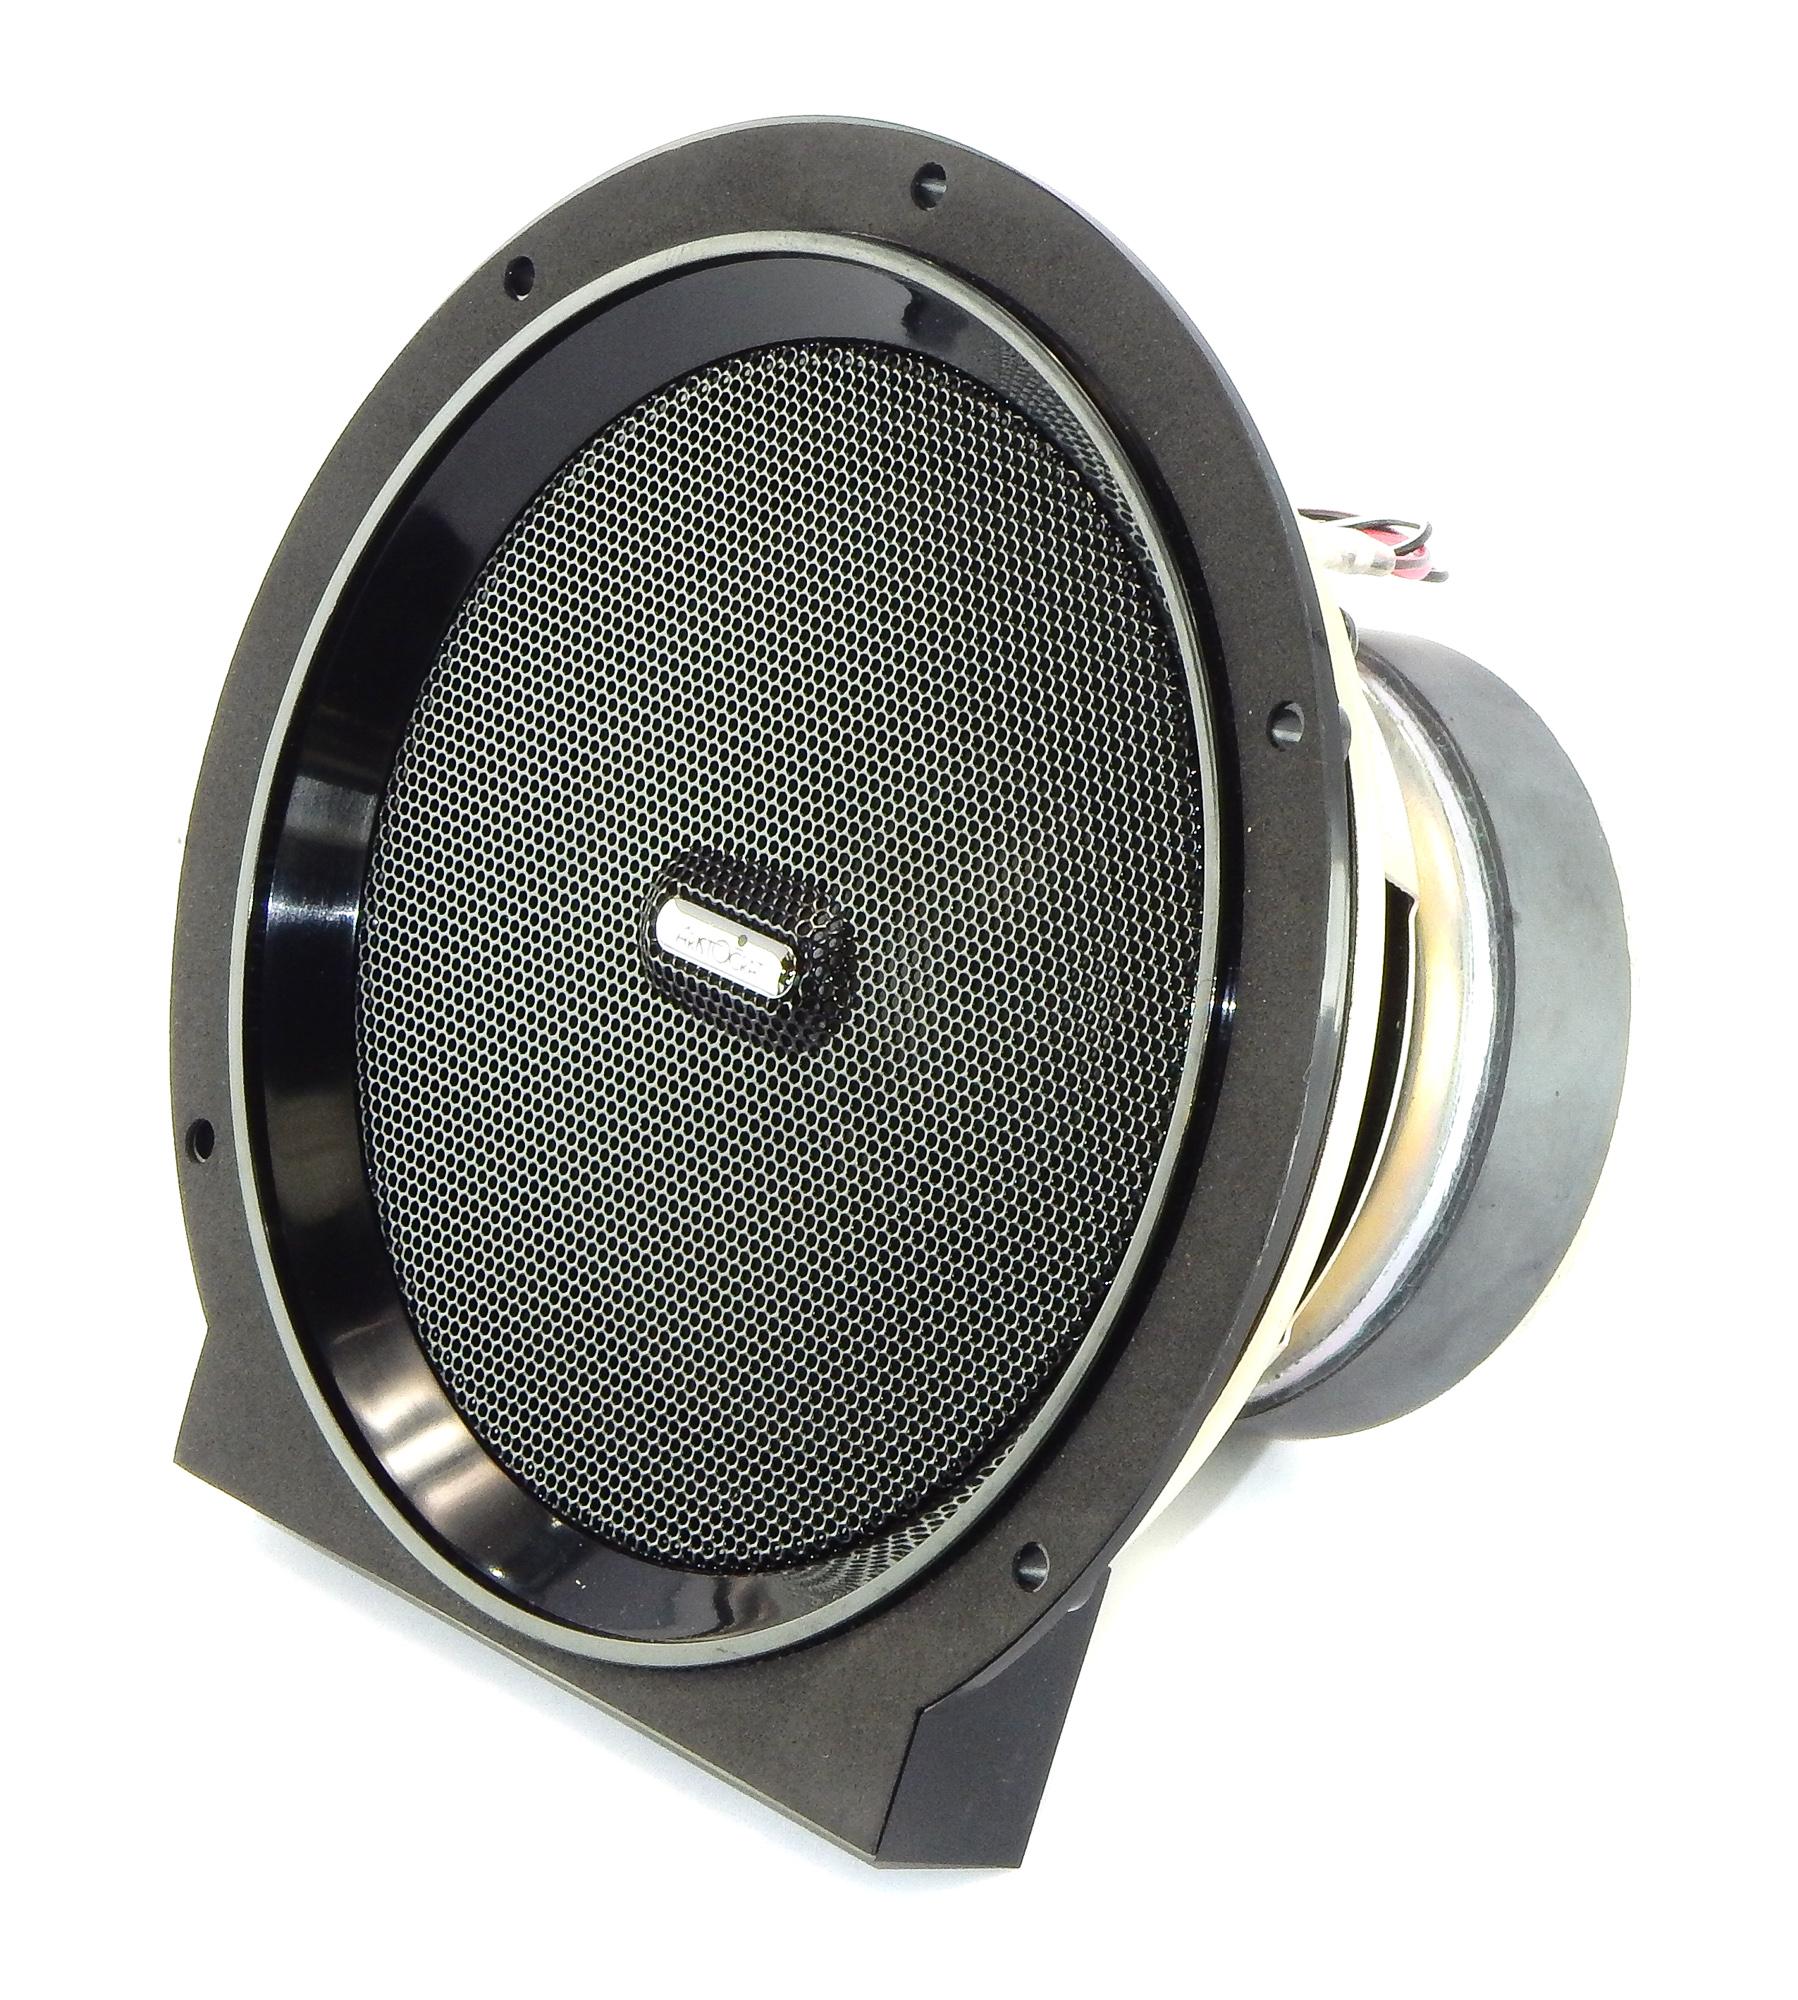 "Aristocrat FSB425065-0801 Easttech 8 Ohm 50W 6.5"" Speaker w/ 6pin adapter - New"